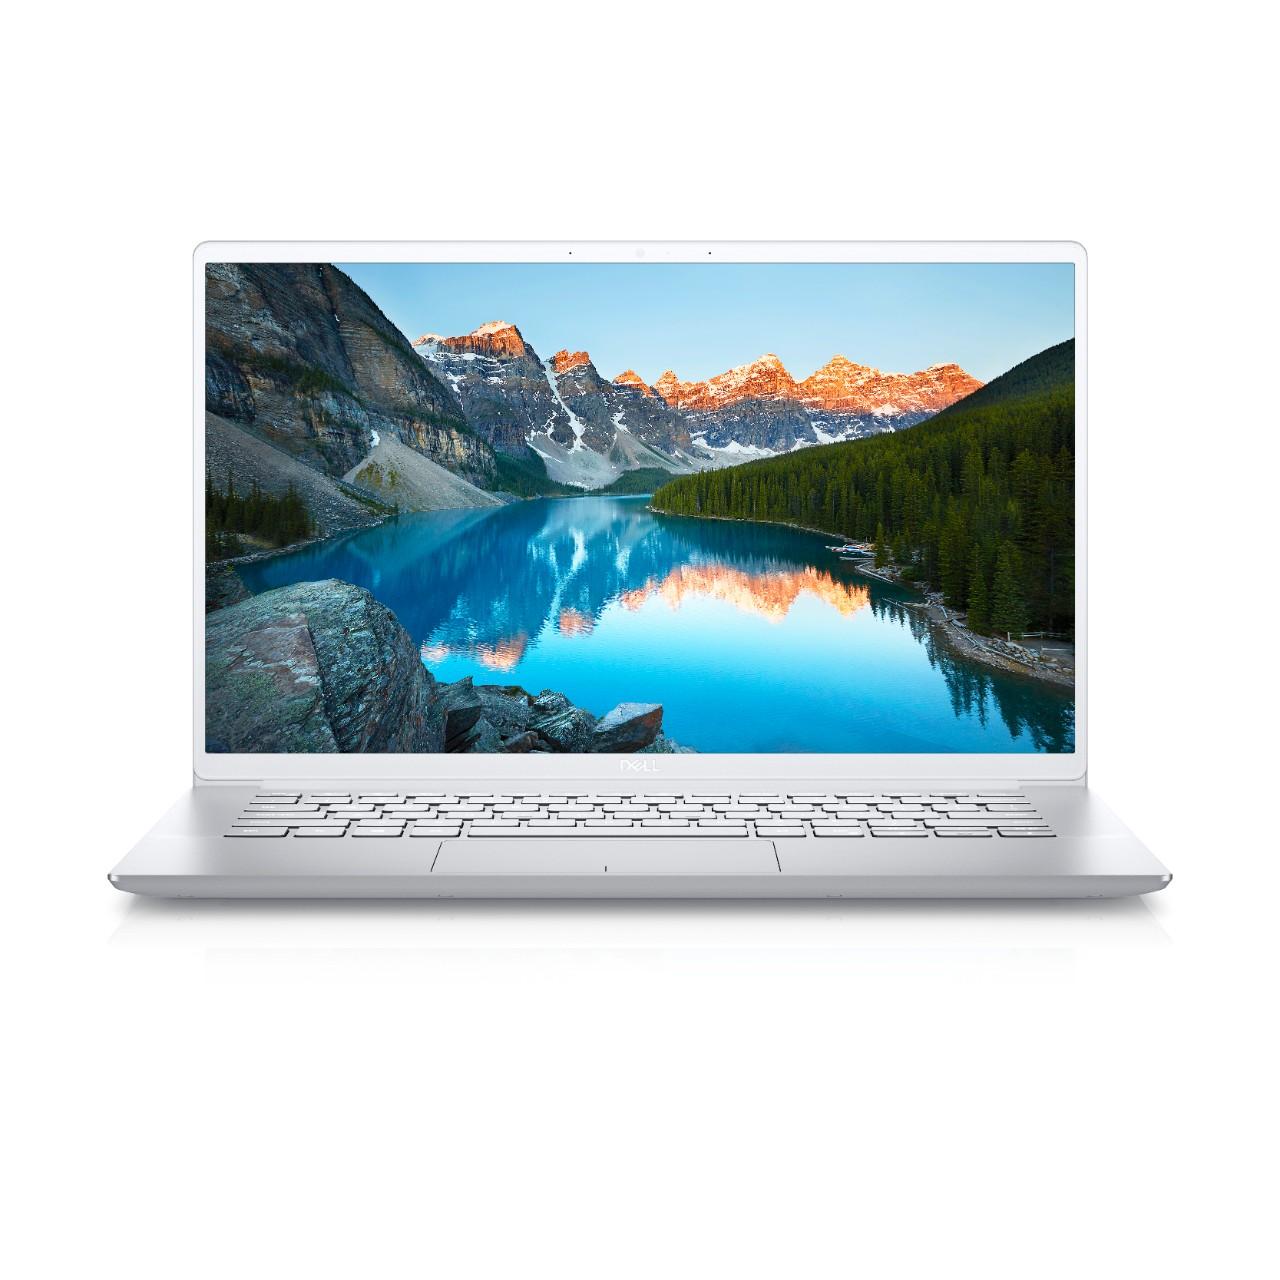 "Dell Inspiron 7490 14"" FHD i5-10210U 8GB 512GB SSD -  Silver"